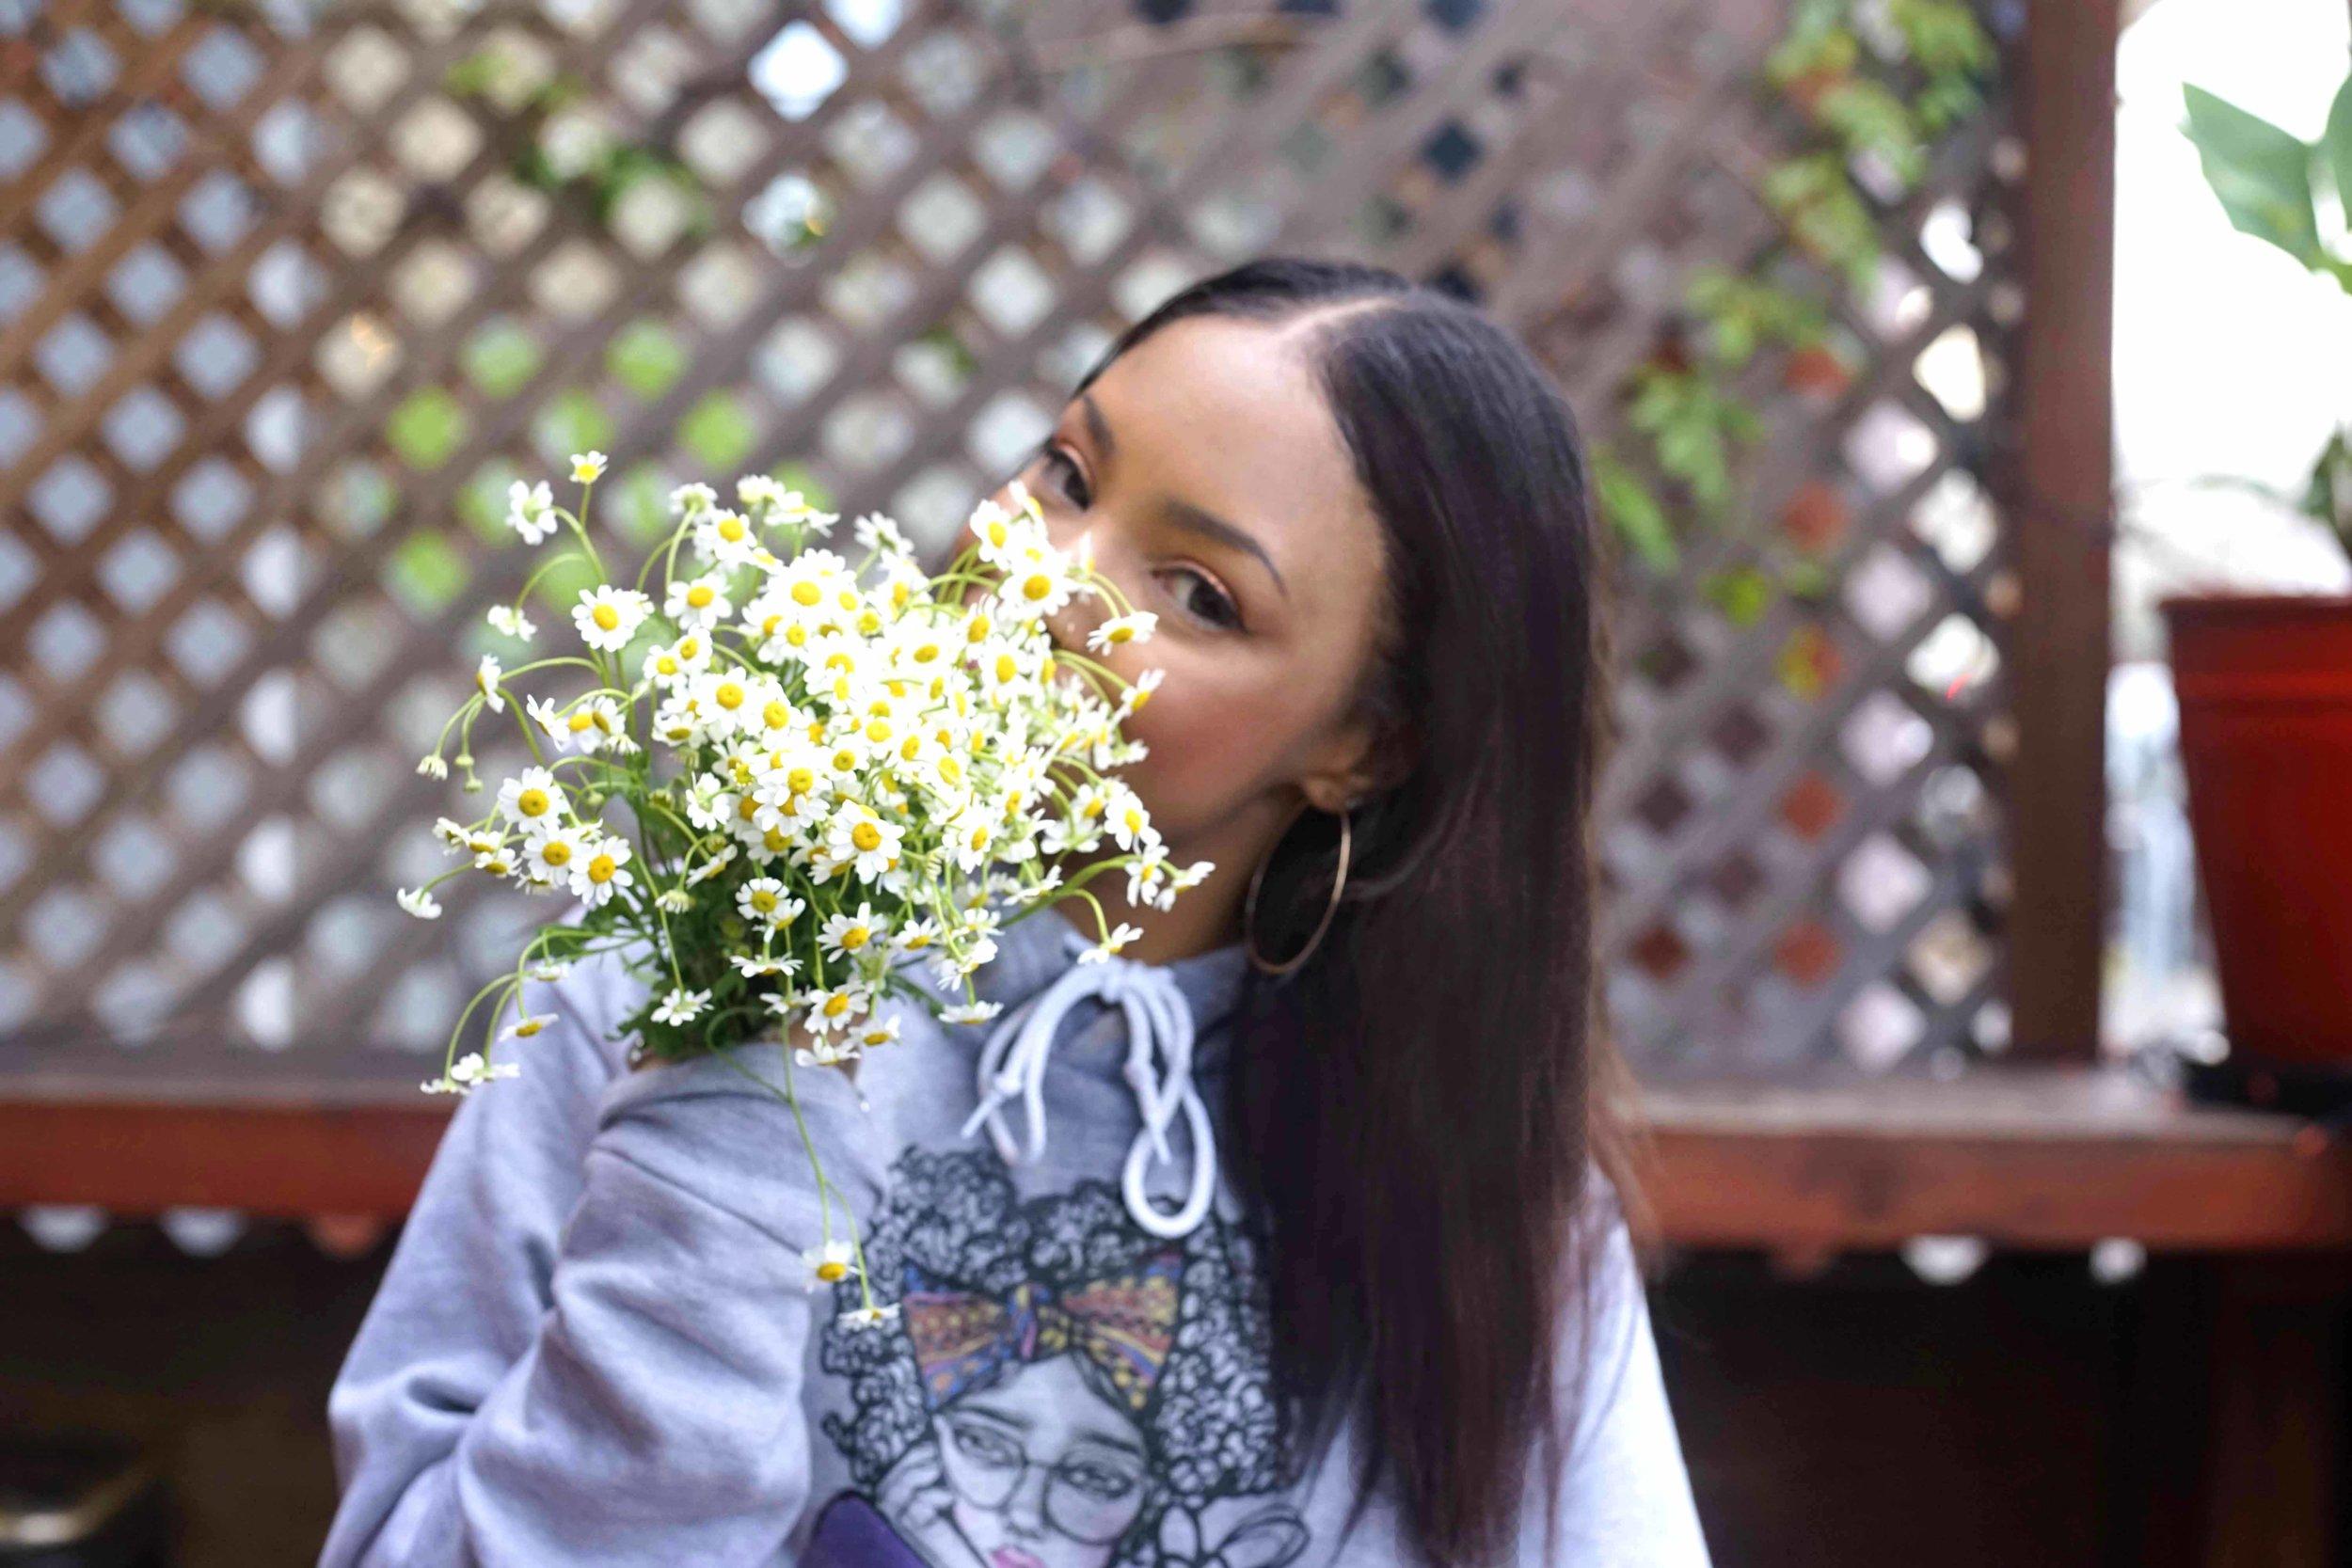 Blossoming into a Badass - BY #STUKGIRL RYANE